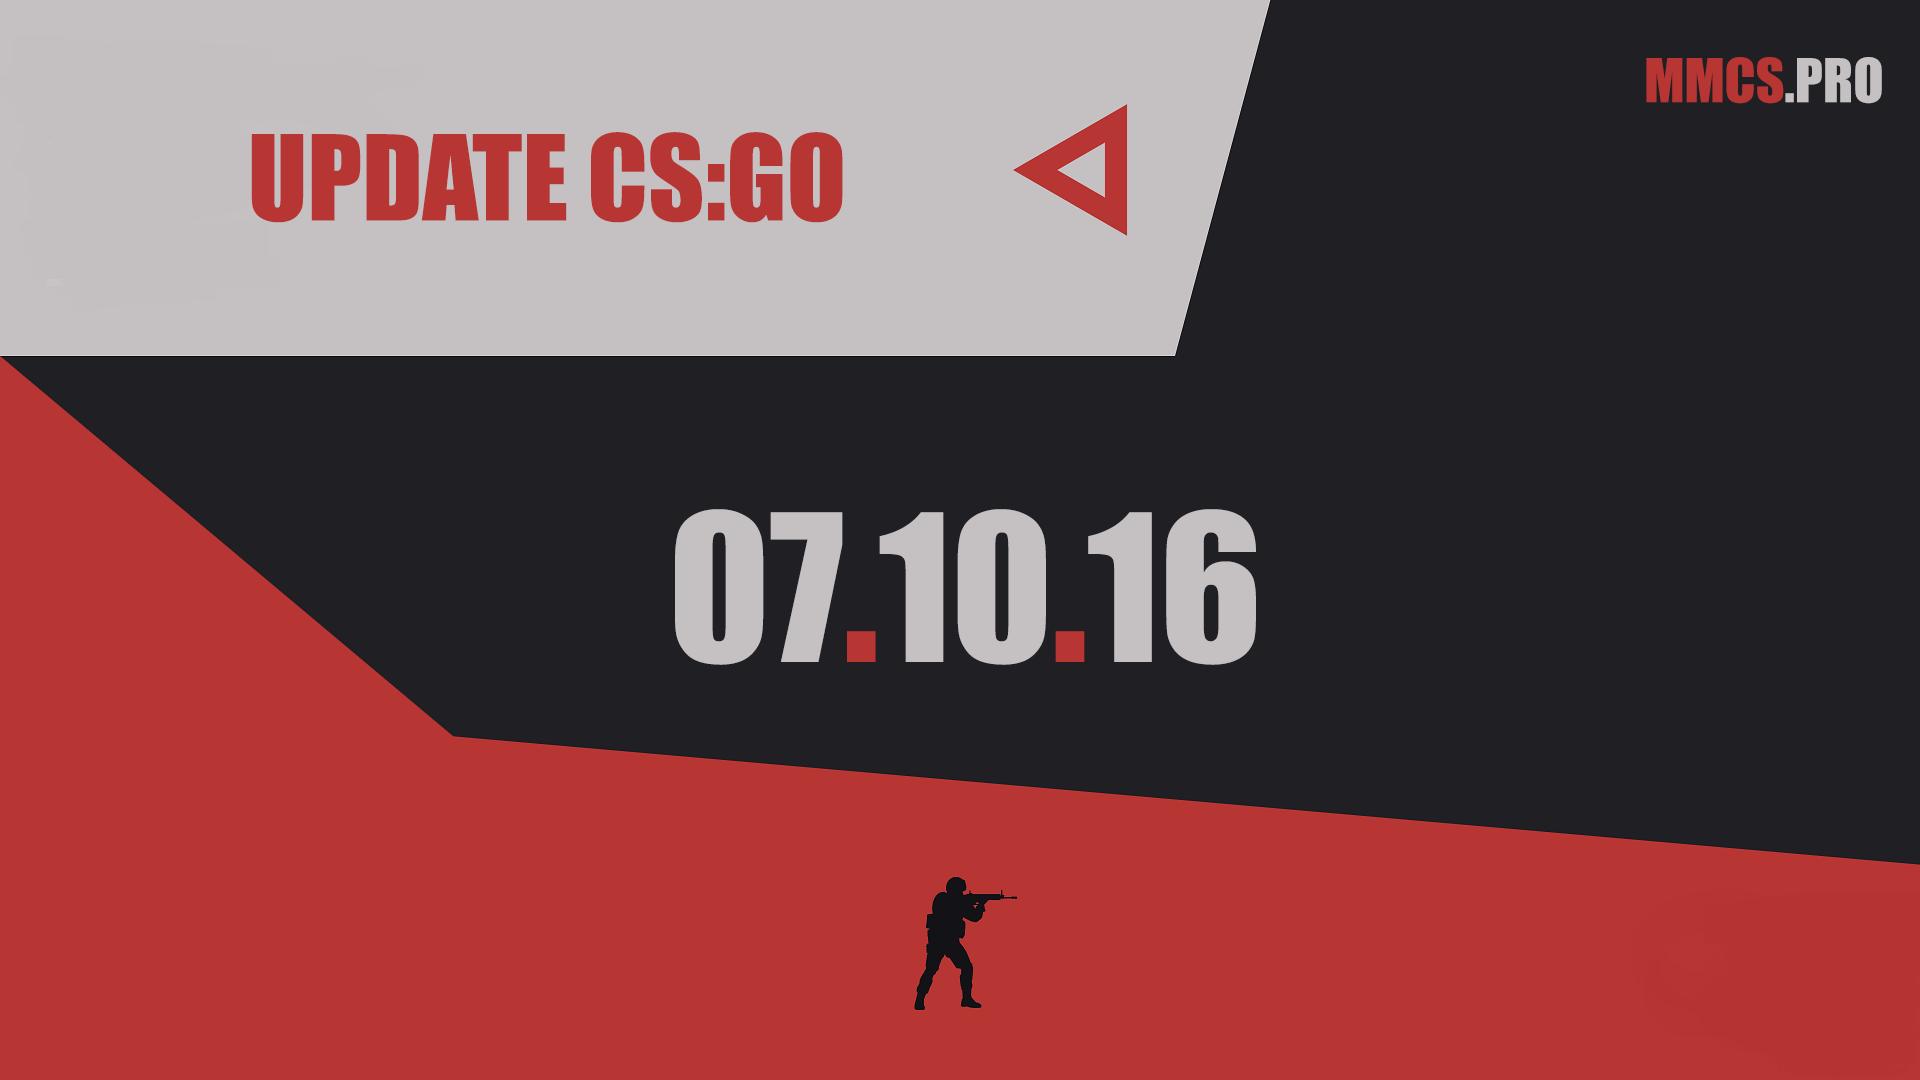 https://mmcs.pro/update-csgo-07-10-2016-valve/